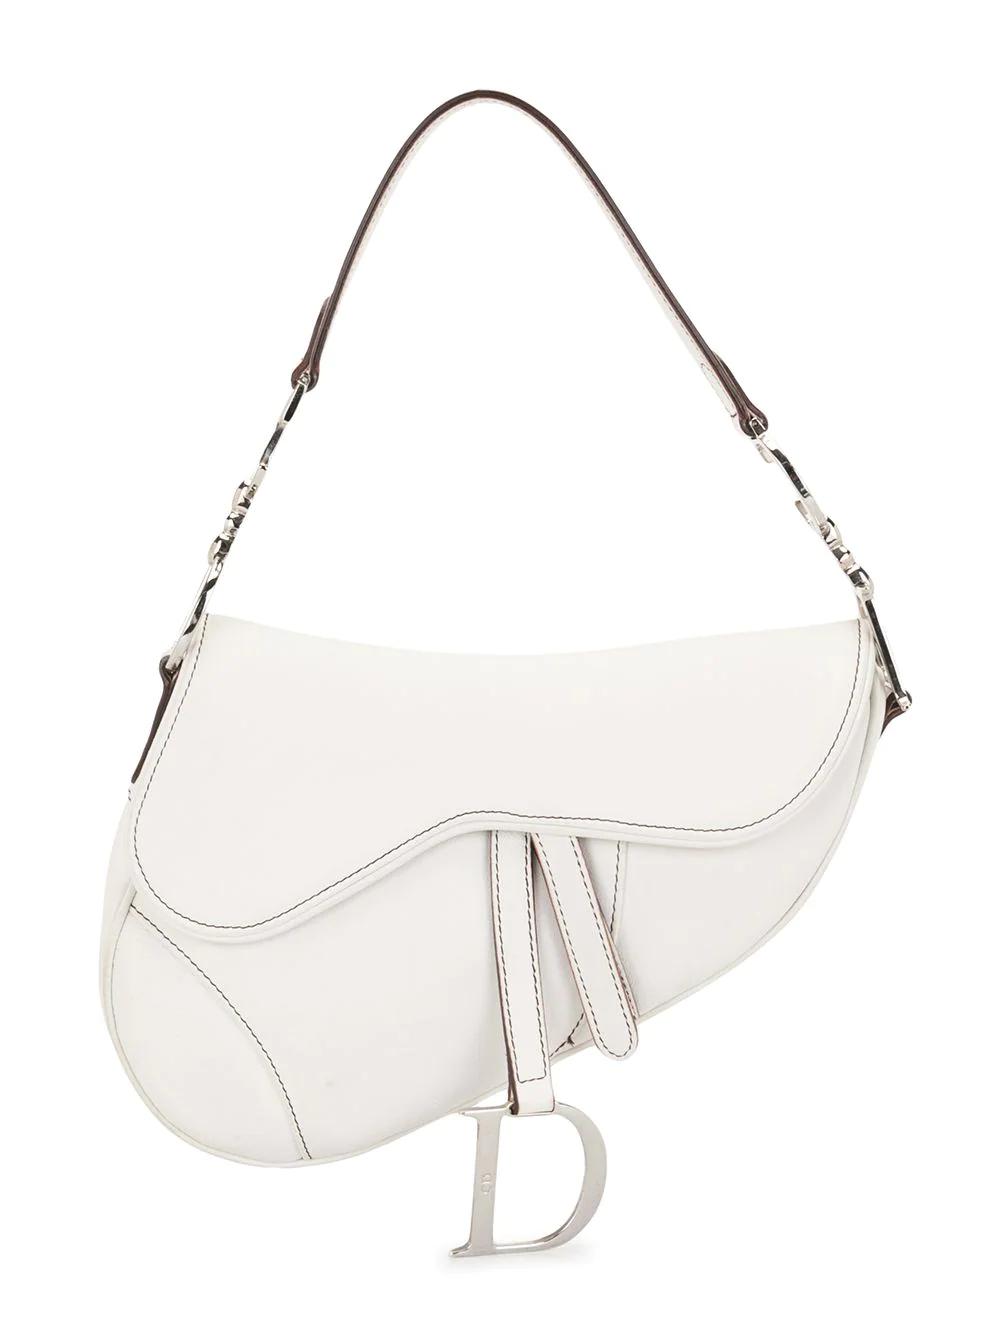 Dior | Christian Dior сумка на плечо Saddle pre-owned | Clouty